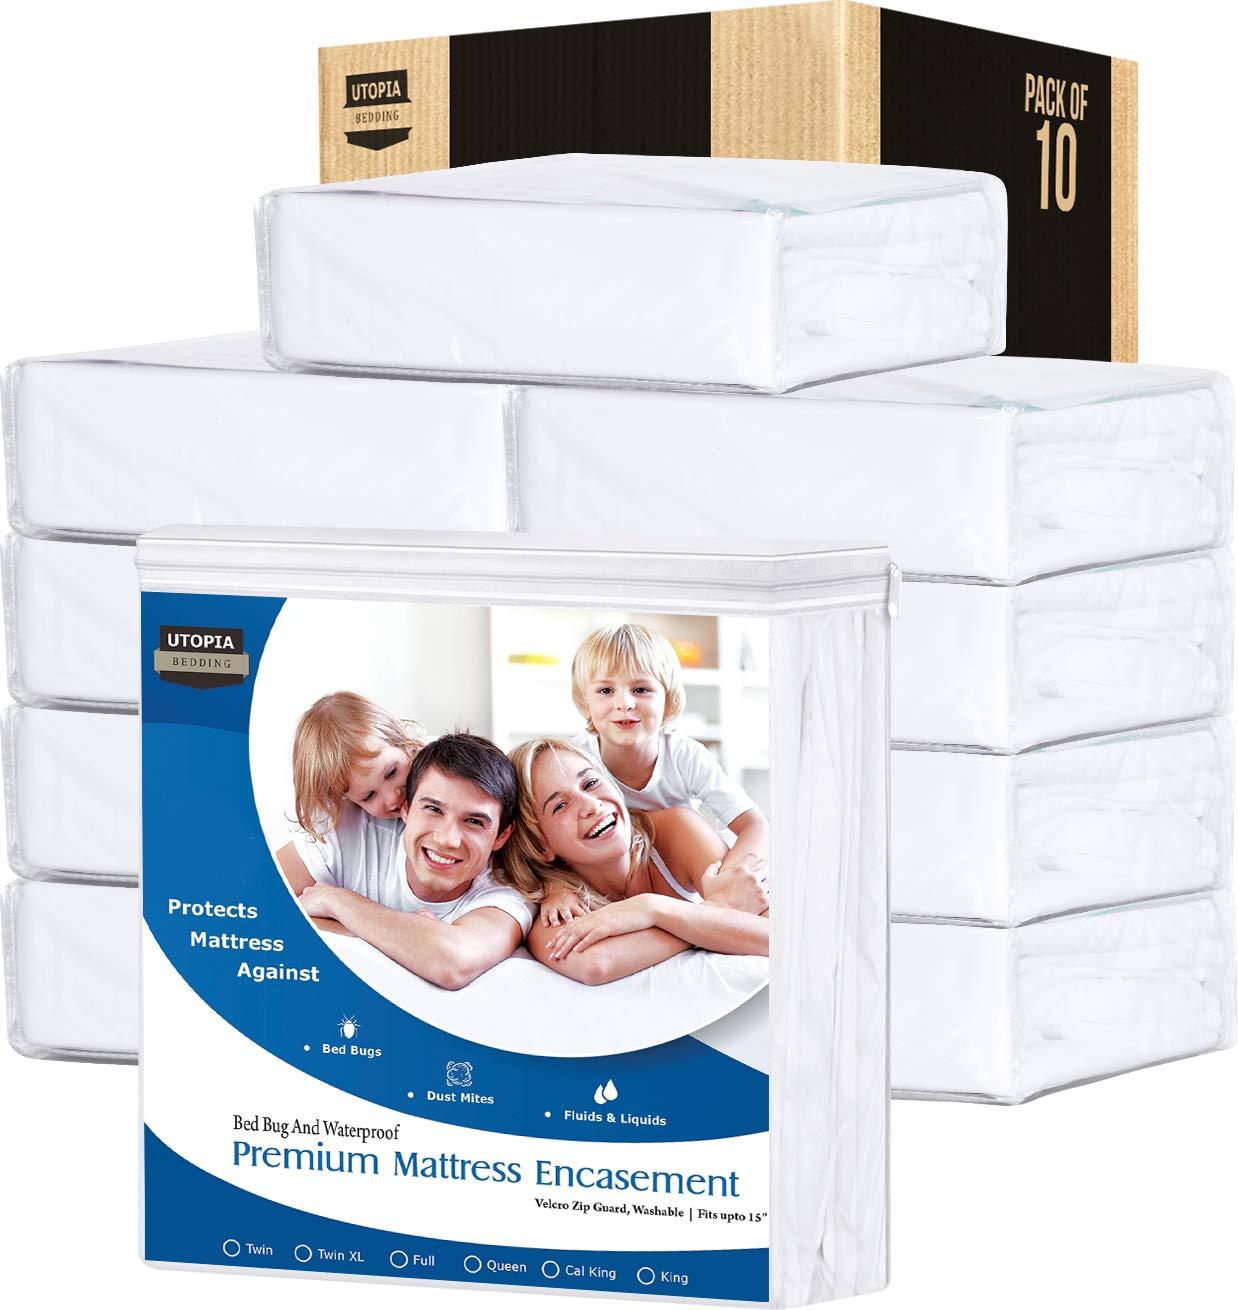 Utopia Bedding Premium Zippered Waterproof Mattress Encasement - Zipper Opening Protector - Fits 15 Inches Deep - Bed Bug Proof (Pack of 10, Cal King)